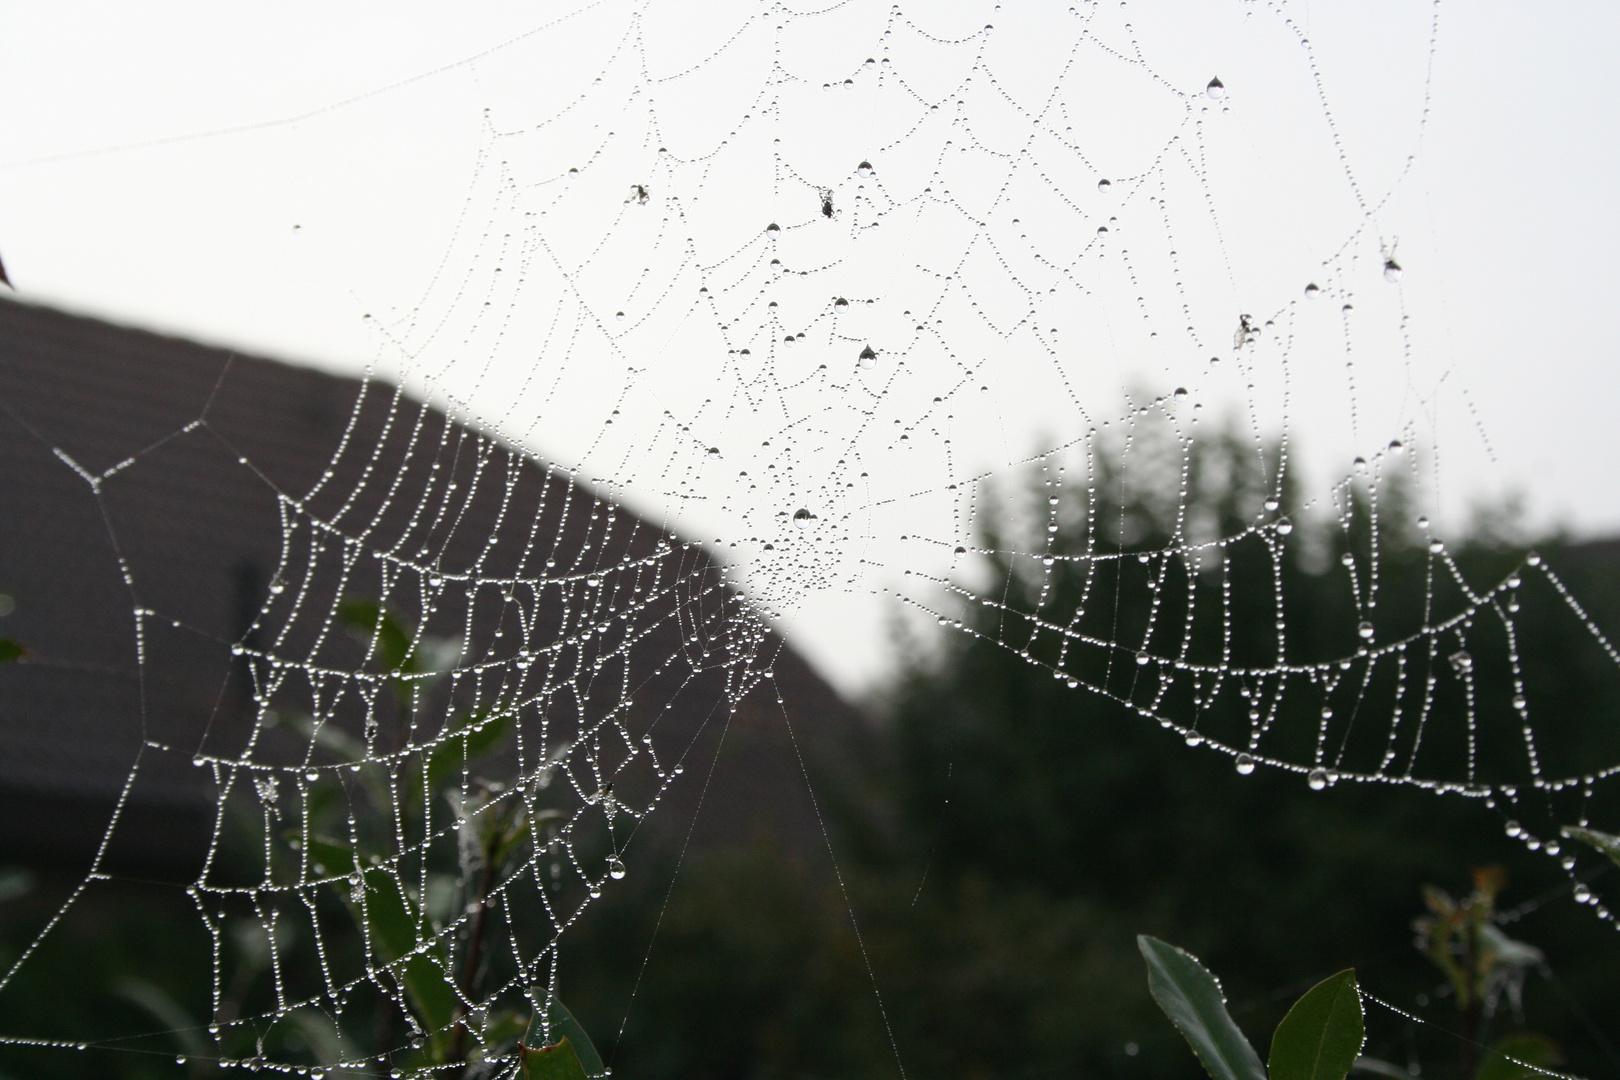 Morgens im Netz